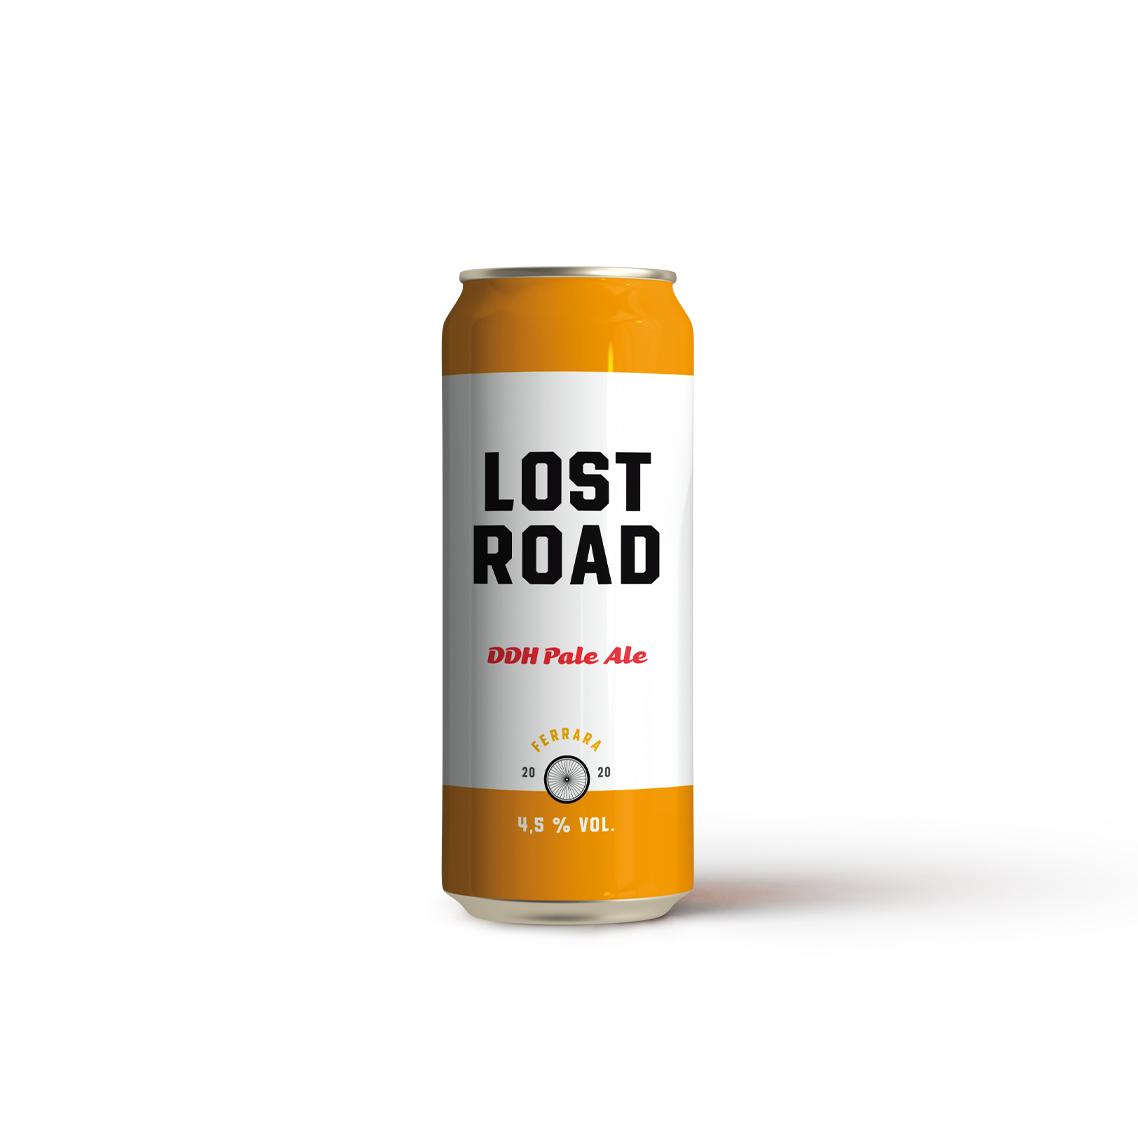 https://www.lostroad.it/wp-content/uploads/2021/07/dh-pale-ale-lost-road-beer.jpg